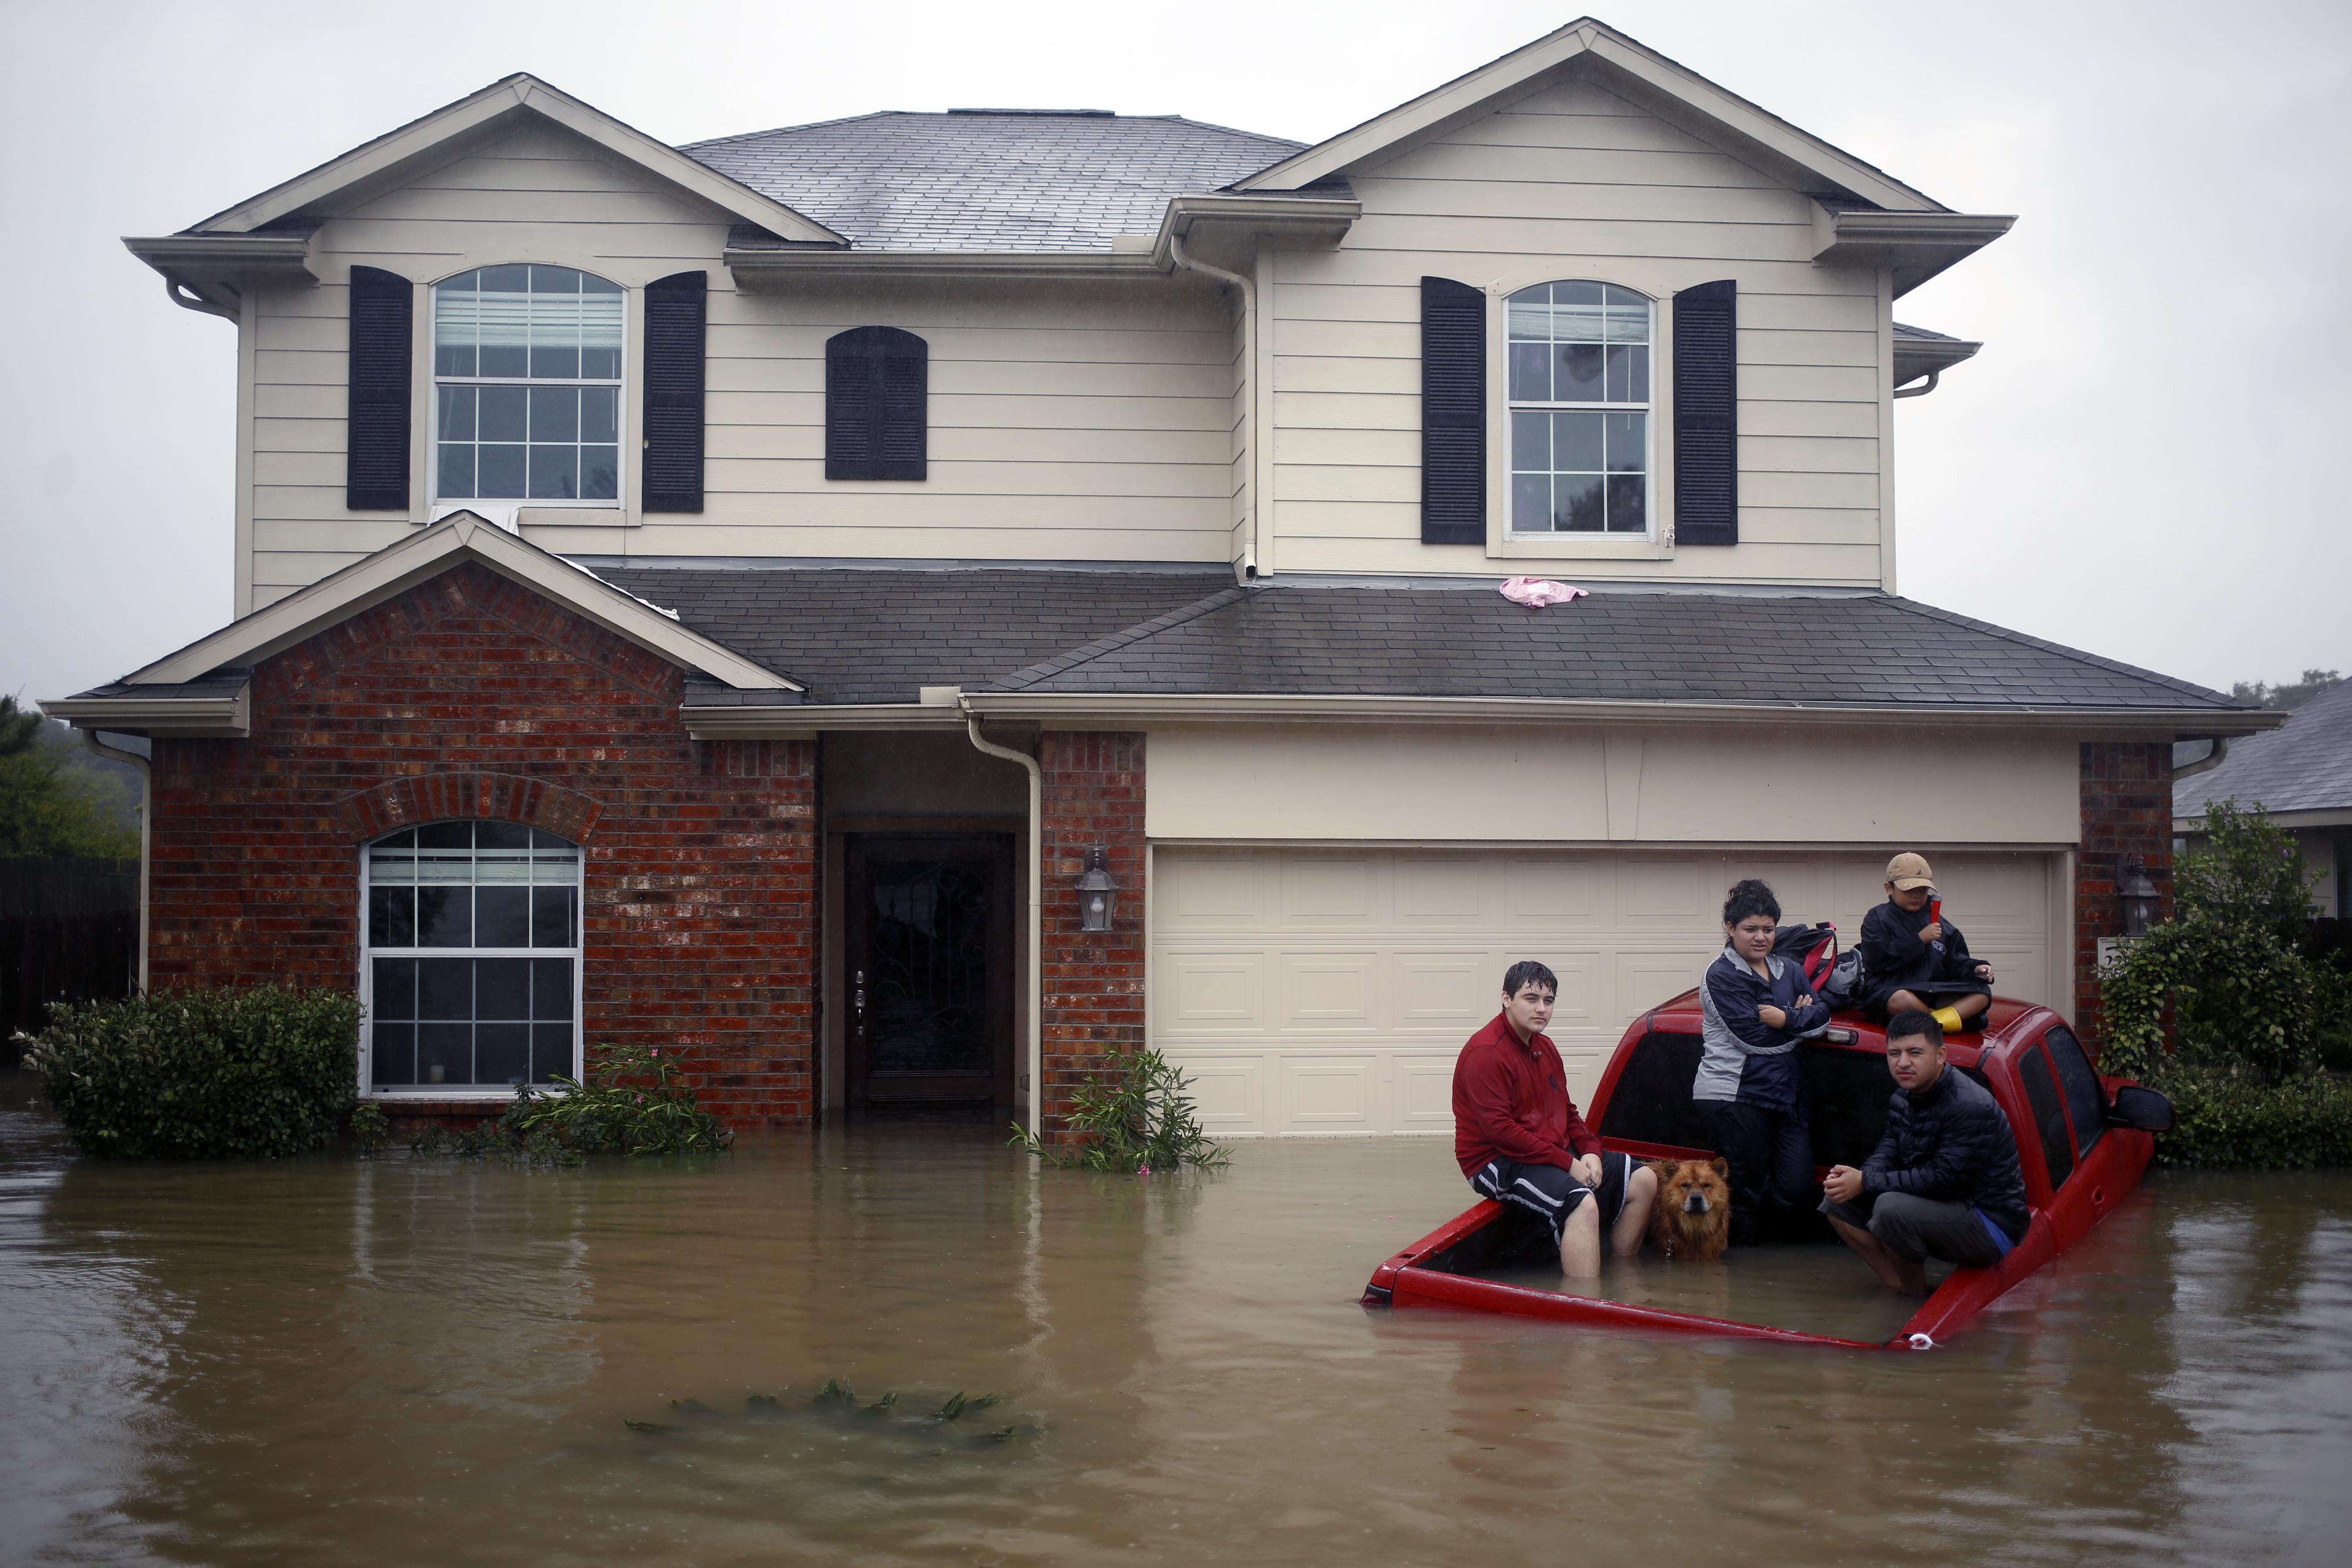 https://assets.sourcemedia.com/9b/91/2f5a8f694e0b84d6033a3108518a/hurricane-harvey-spring-texas.jpg